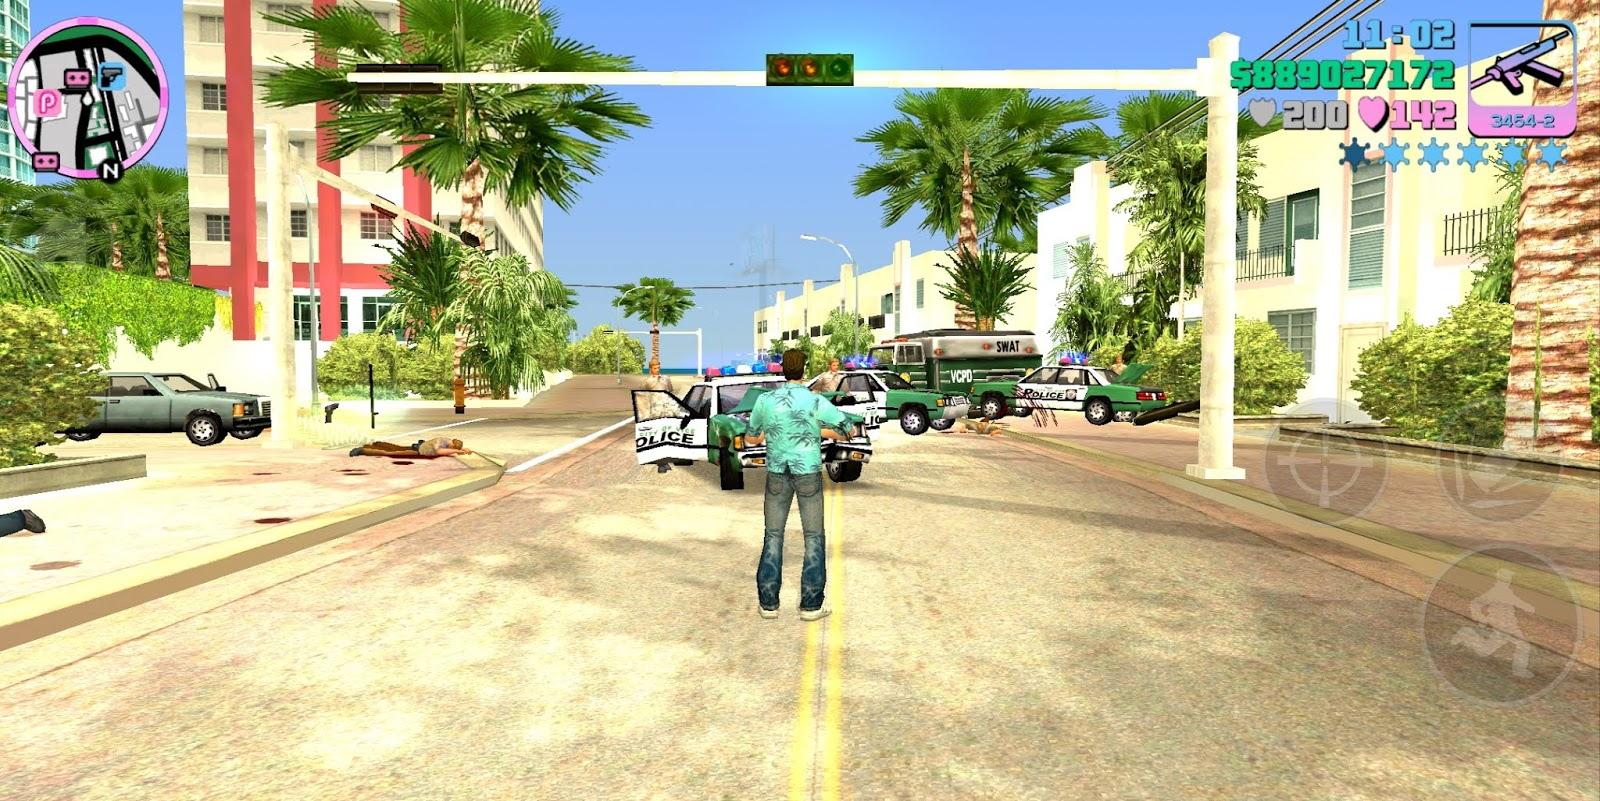 Grand Theft Auto Vice City (GTA) Mega Mod Apk Data Version